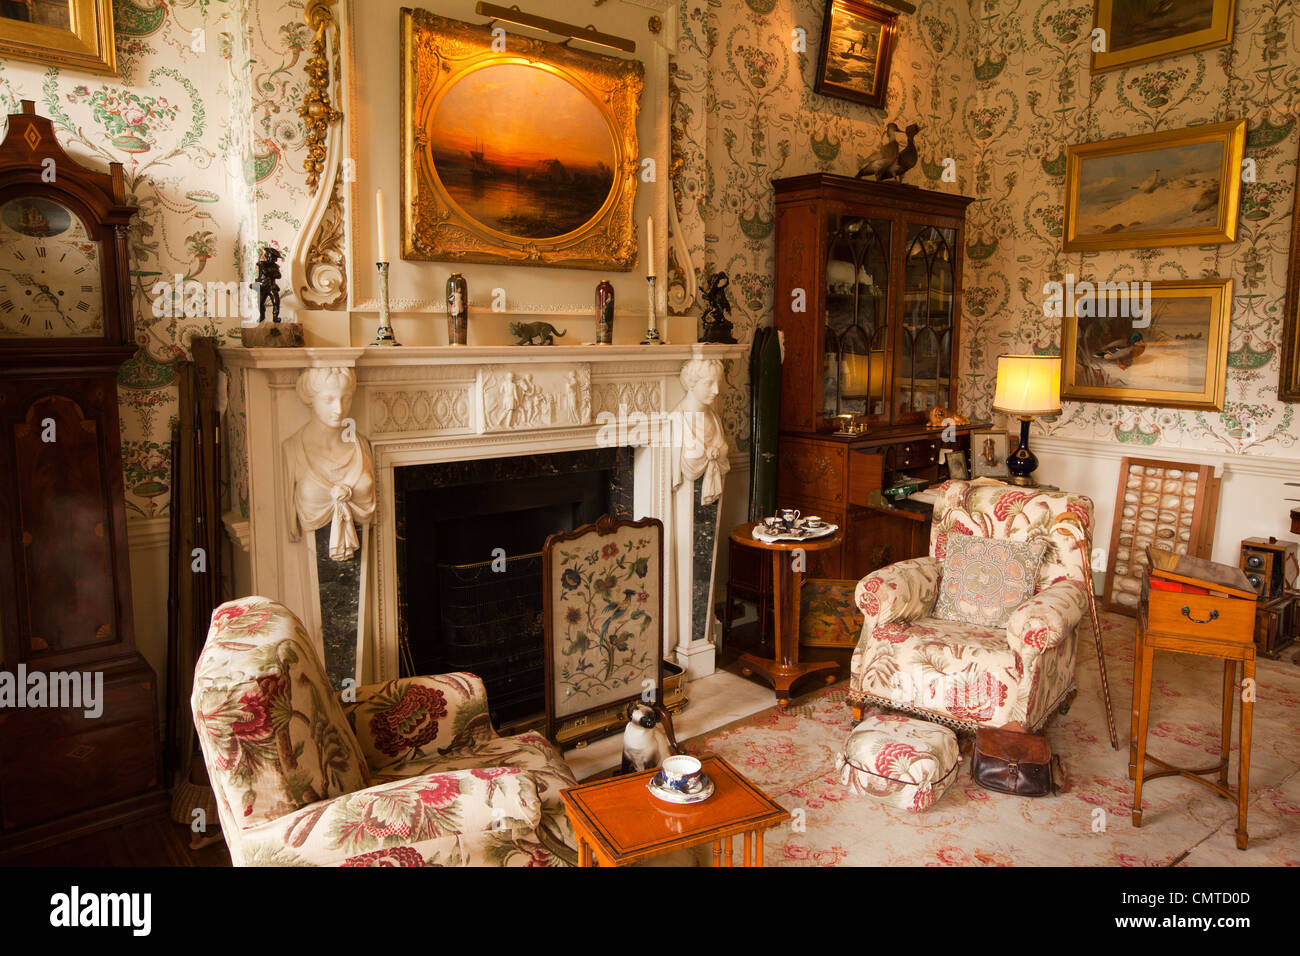 UK, England, Bedfordshire, Woburn Abbey interior, the Flying Duchess' Room - Stock Image